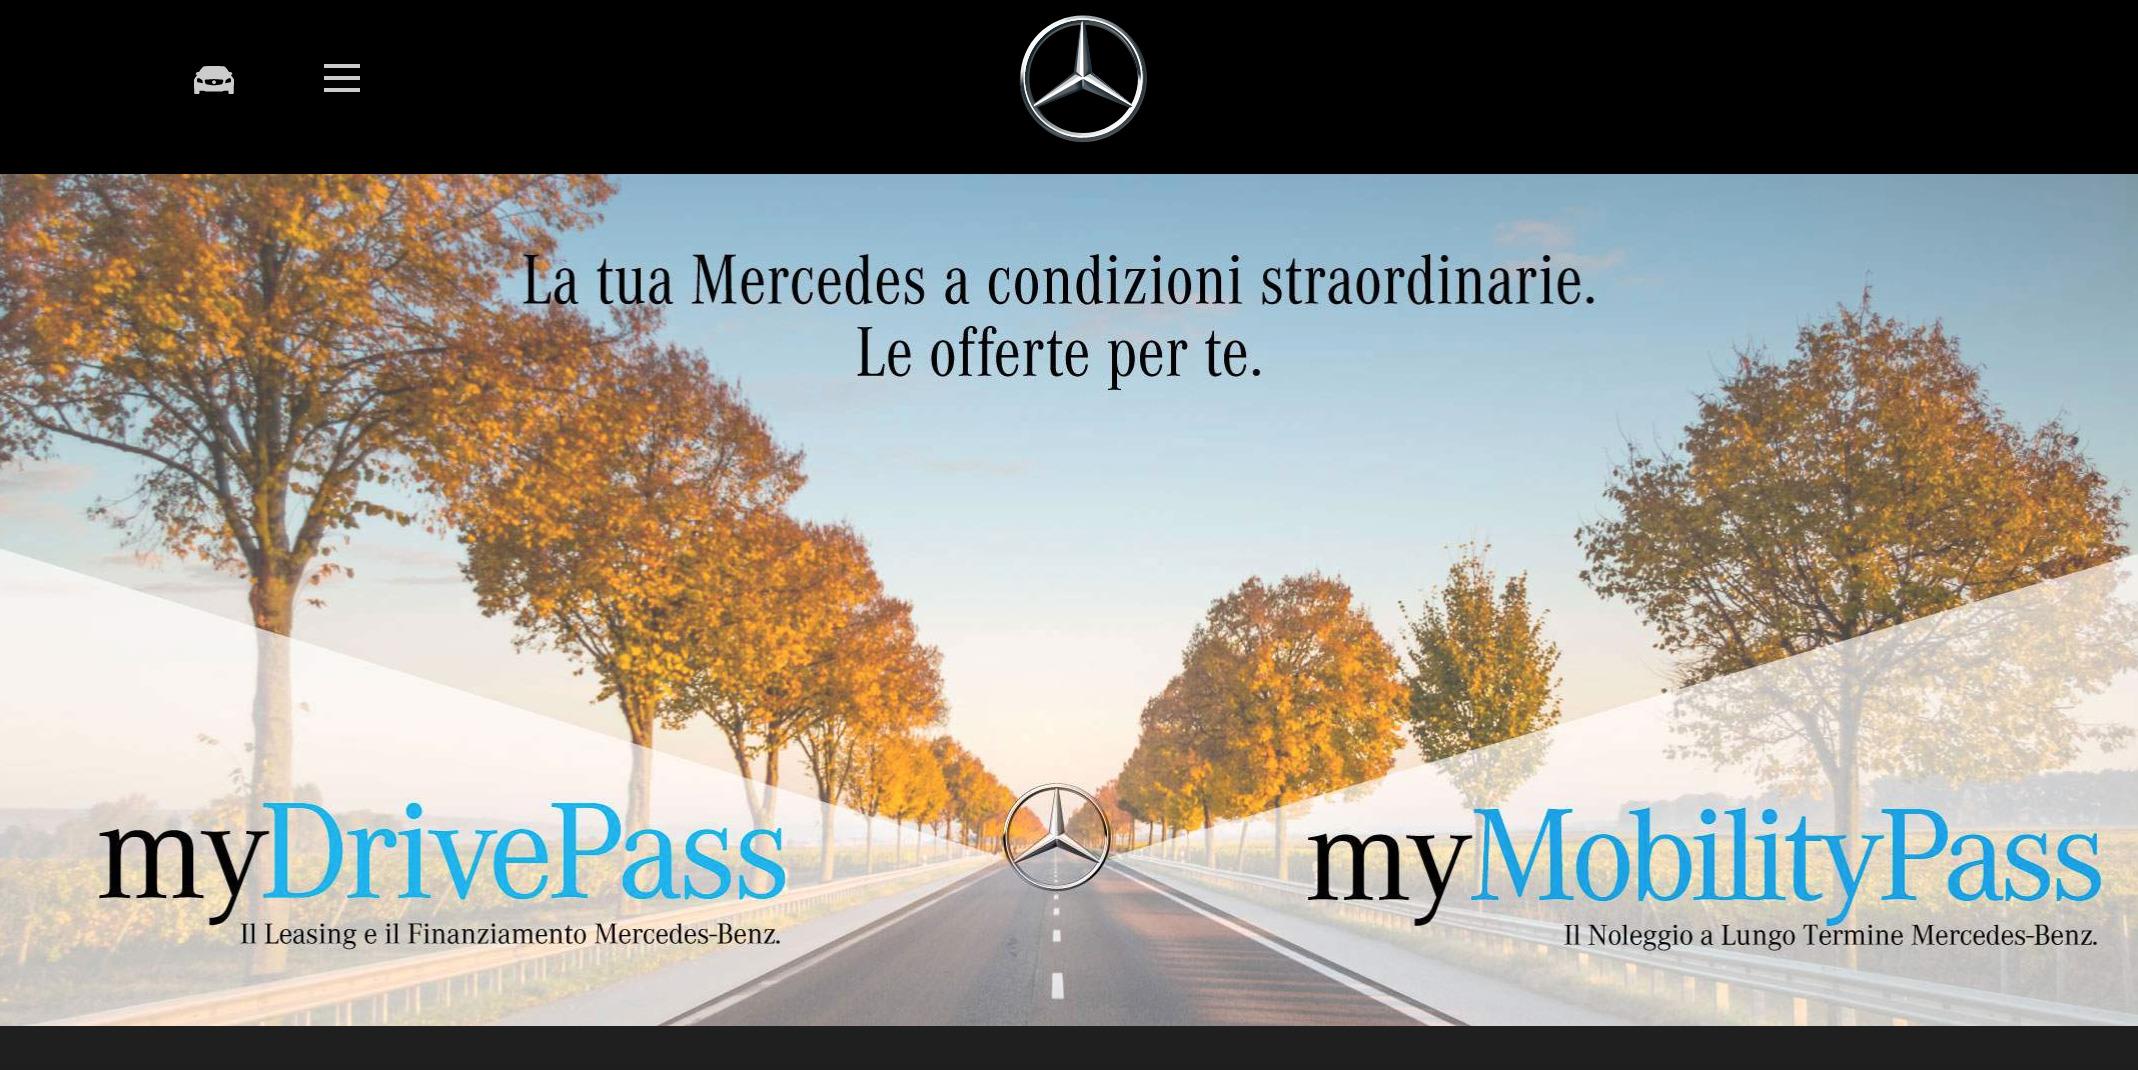 Mercedes Classe C in leasing promozione ad anticipo zero